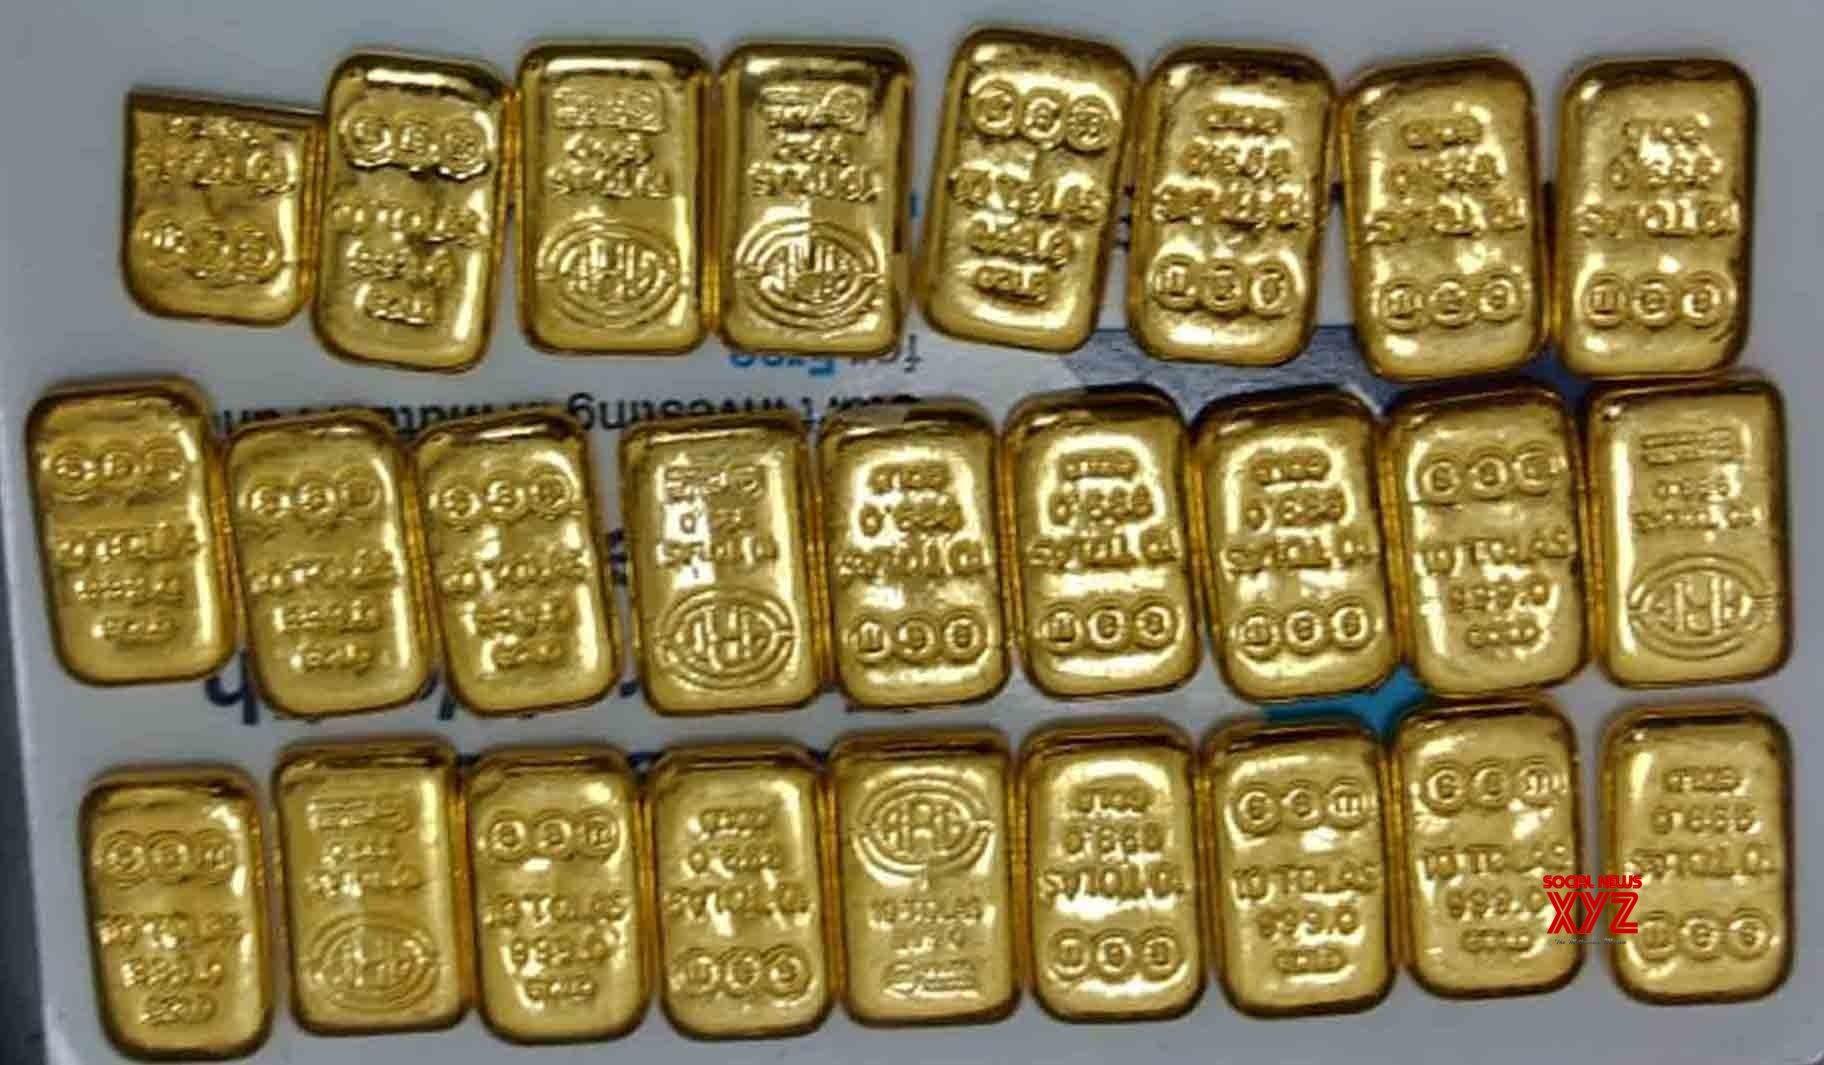 Indian expat finds bag of cash, gold in Dubai